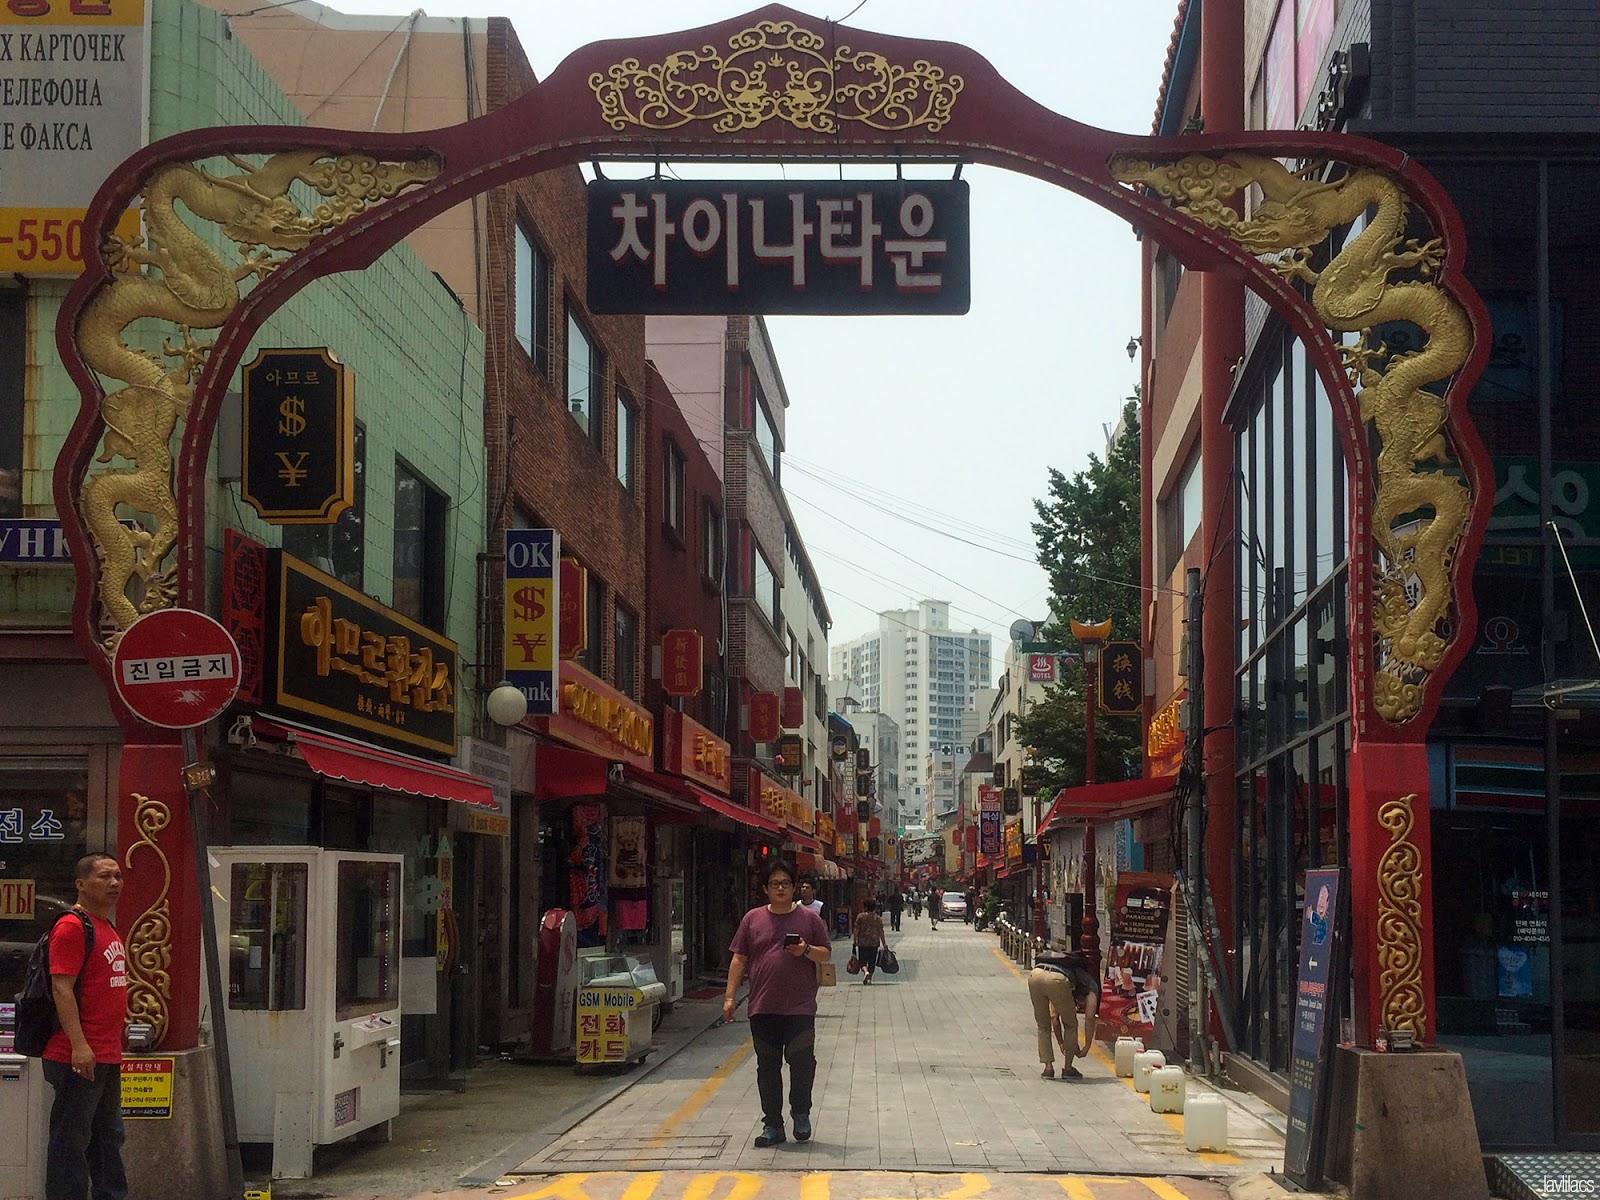 Seoul, Korea - Summer Study Abroad 2014 - Busan Chinatown arch